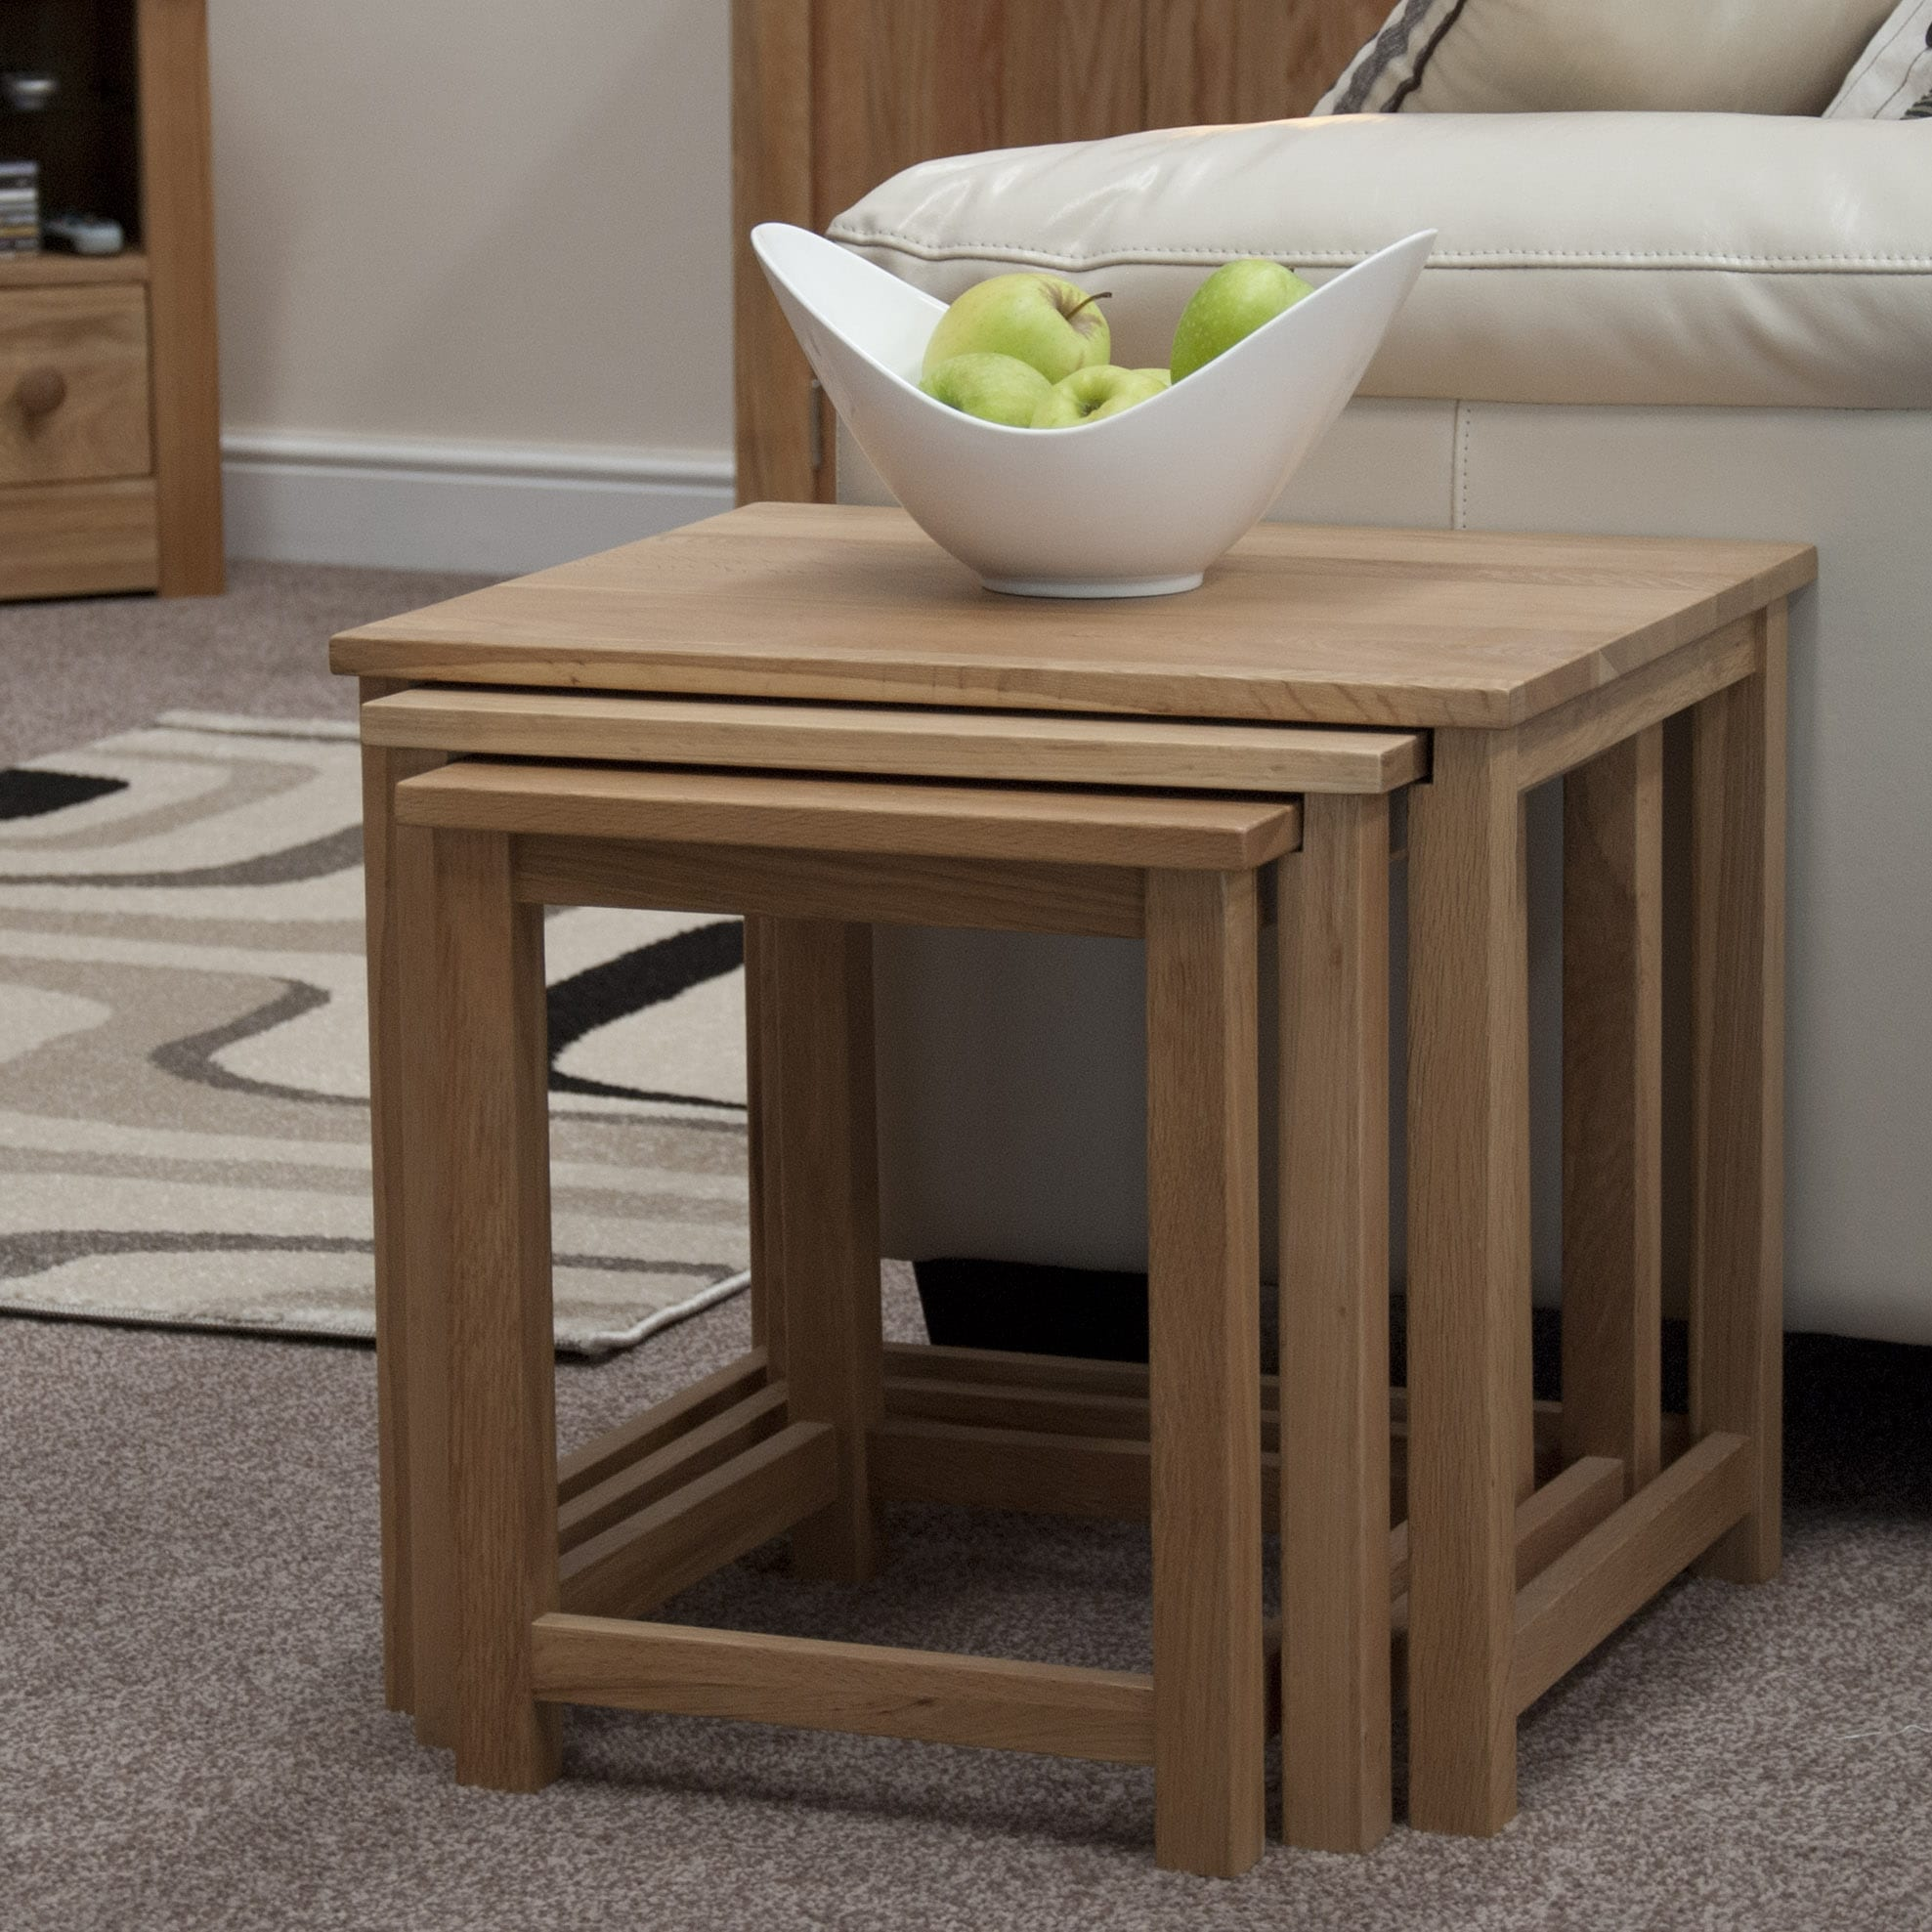 Bury Nest of Tables Lyon range